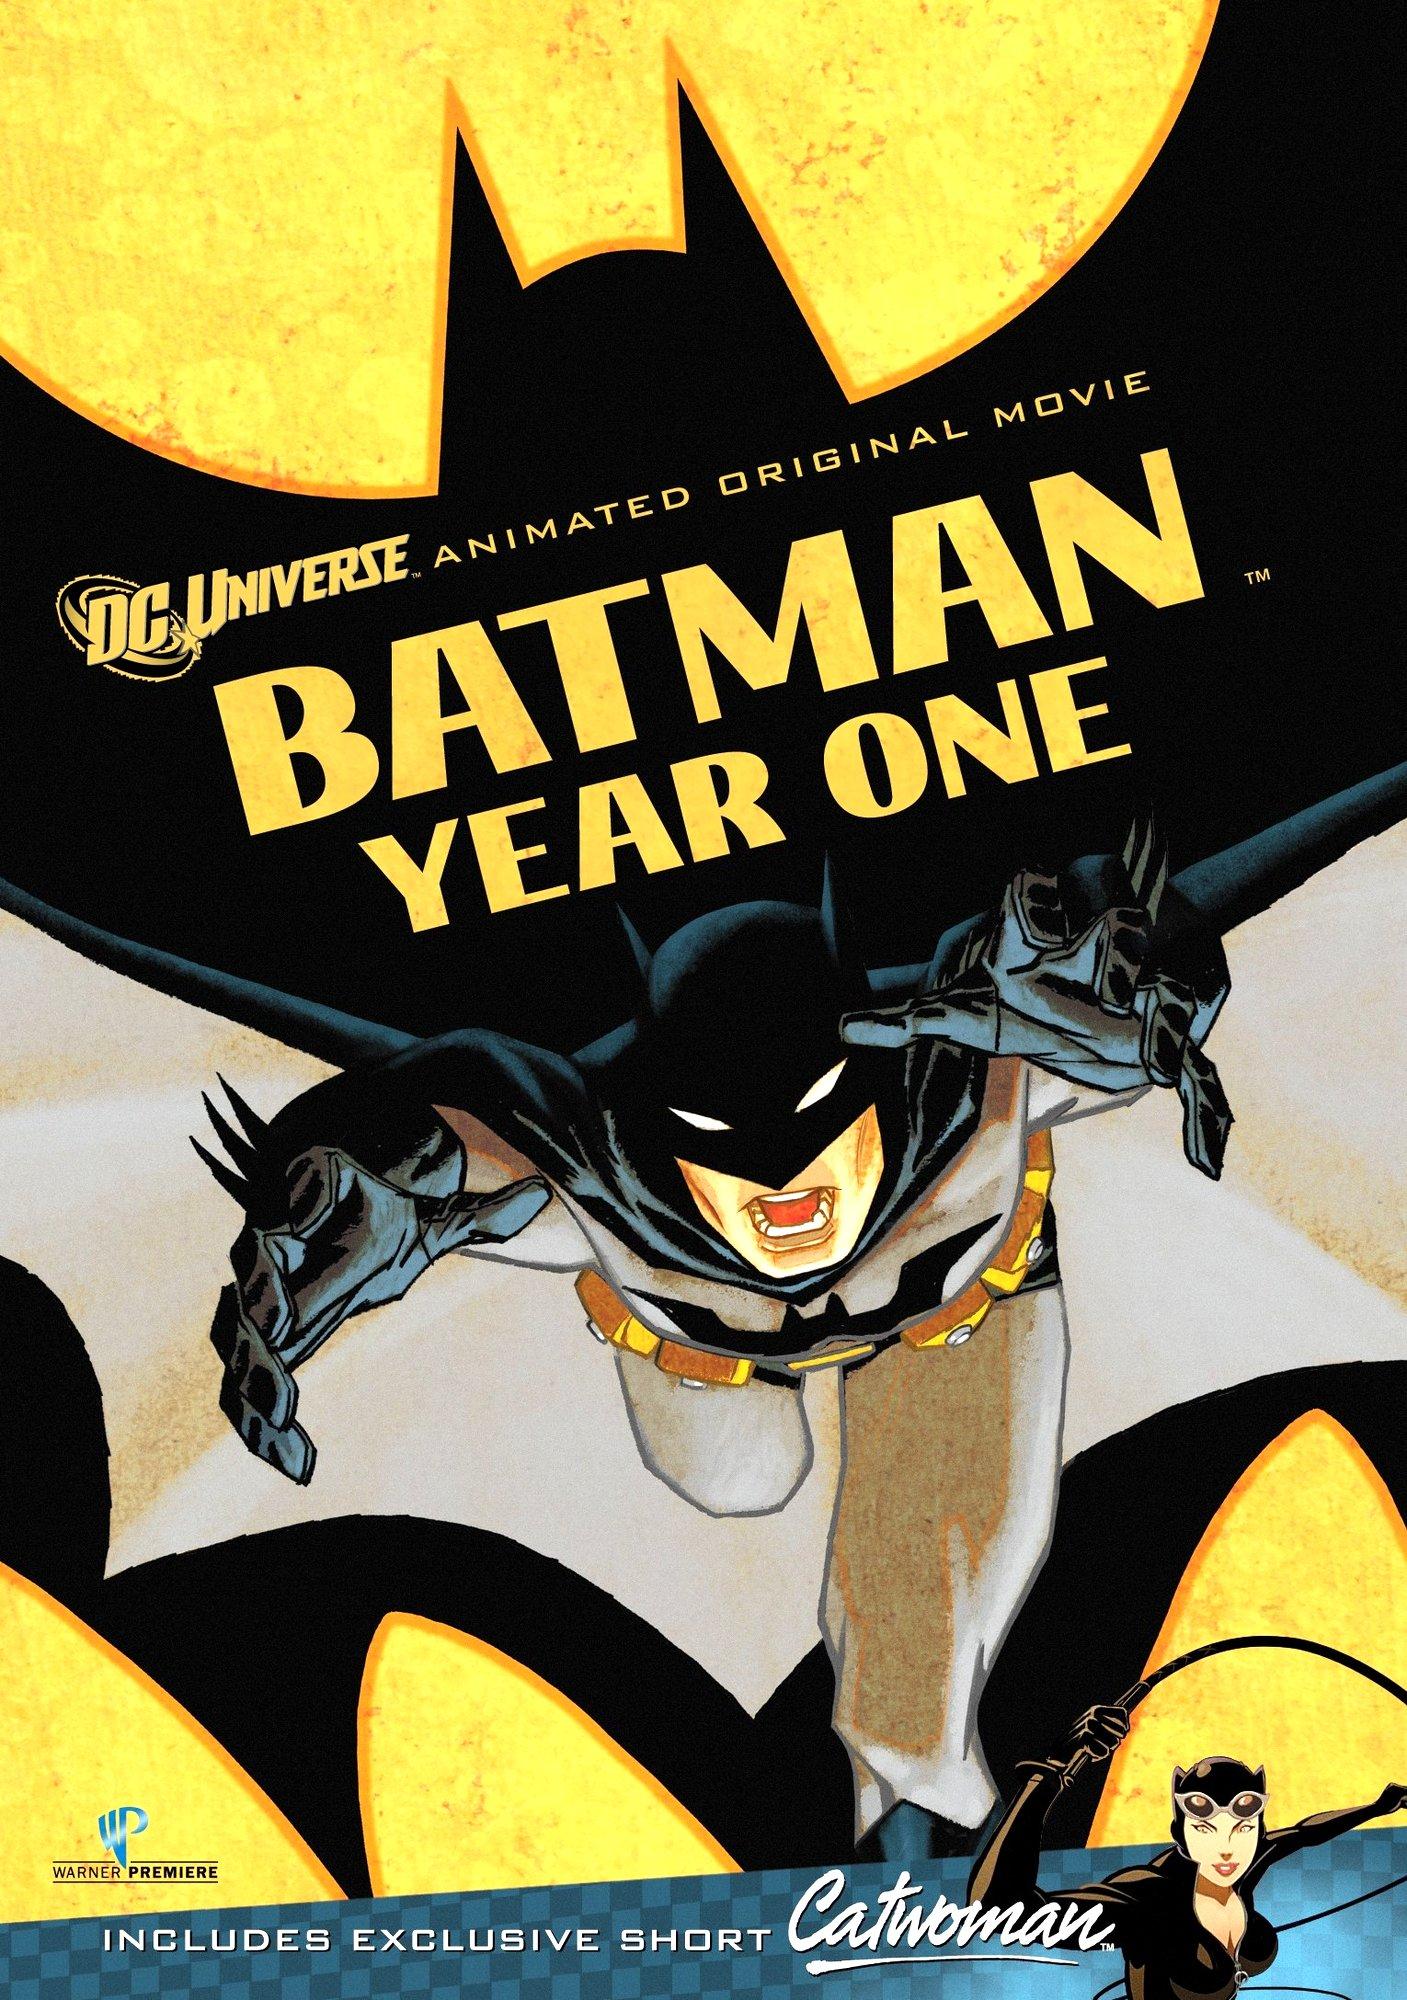 http://img4.wikia.nocookie.net/__cb20110814145448/dcmovies/images/e/e3/Batman_Year_One.jpg